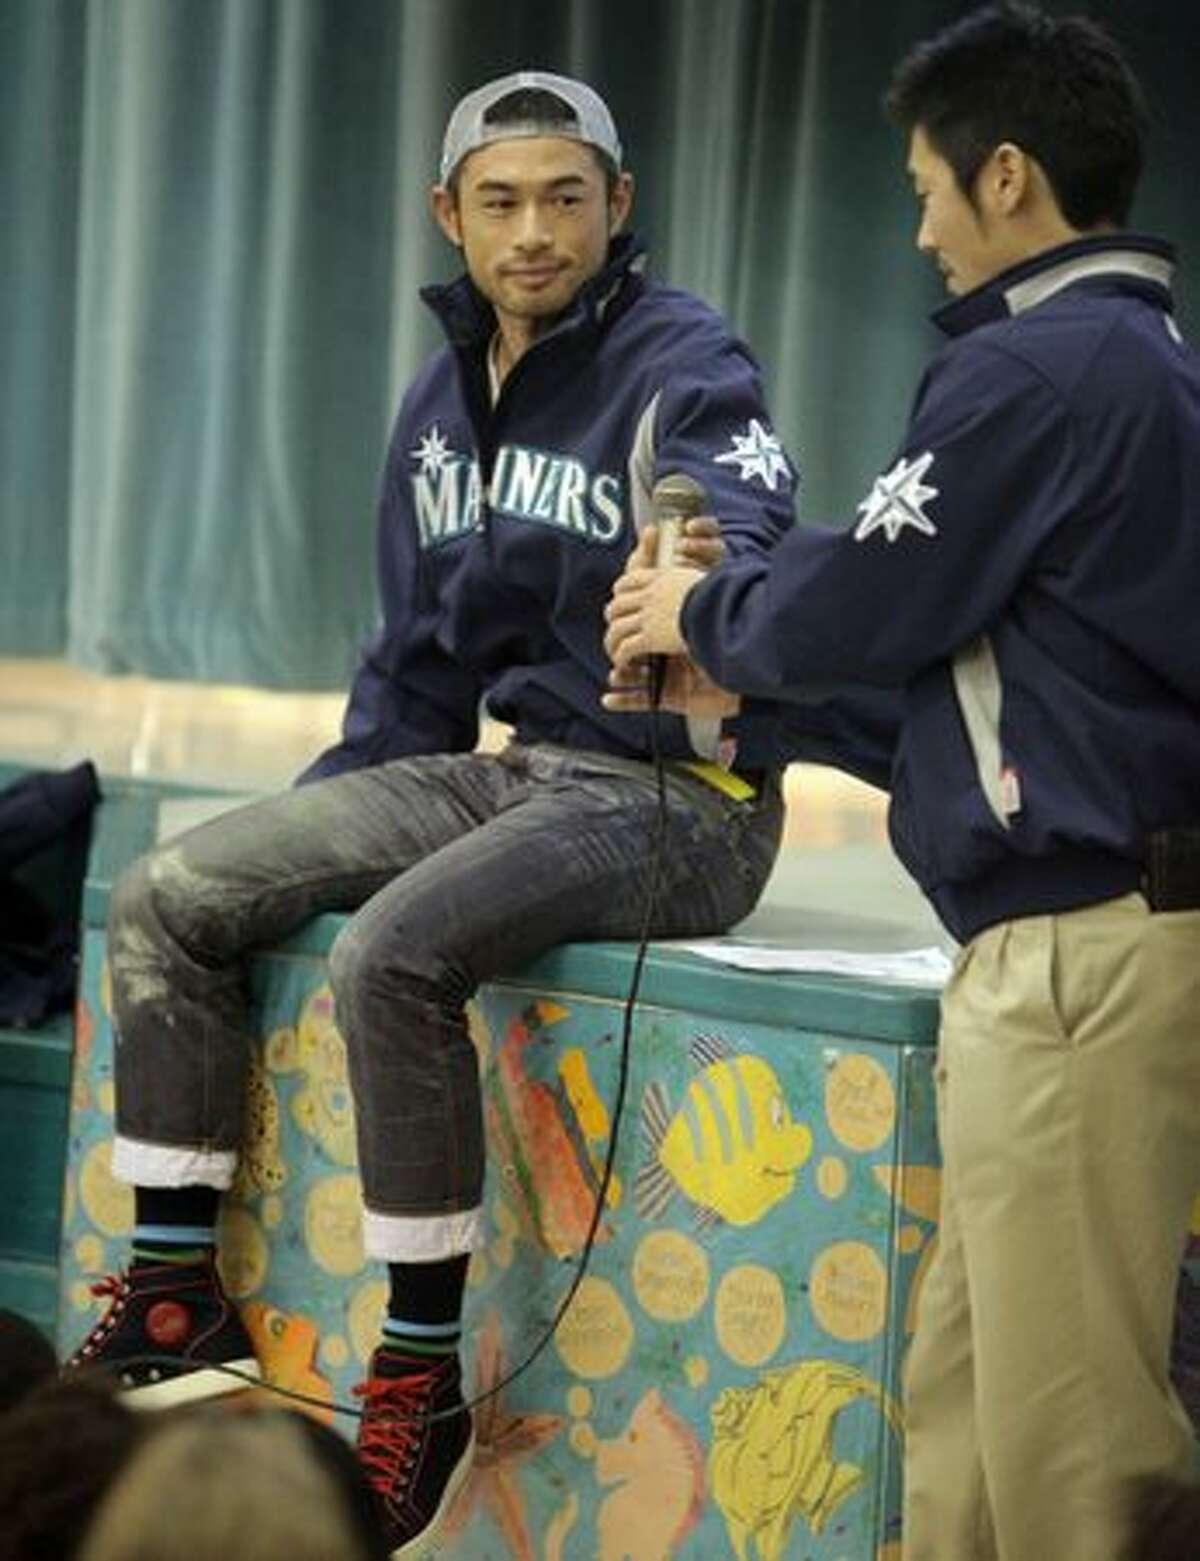 Seattle Mariners player Ichiro Suzuki hands off the mic to interpreter Antony Suzuki during a visit by members of the team to Lakeridge Elementary School in Seattle.